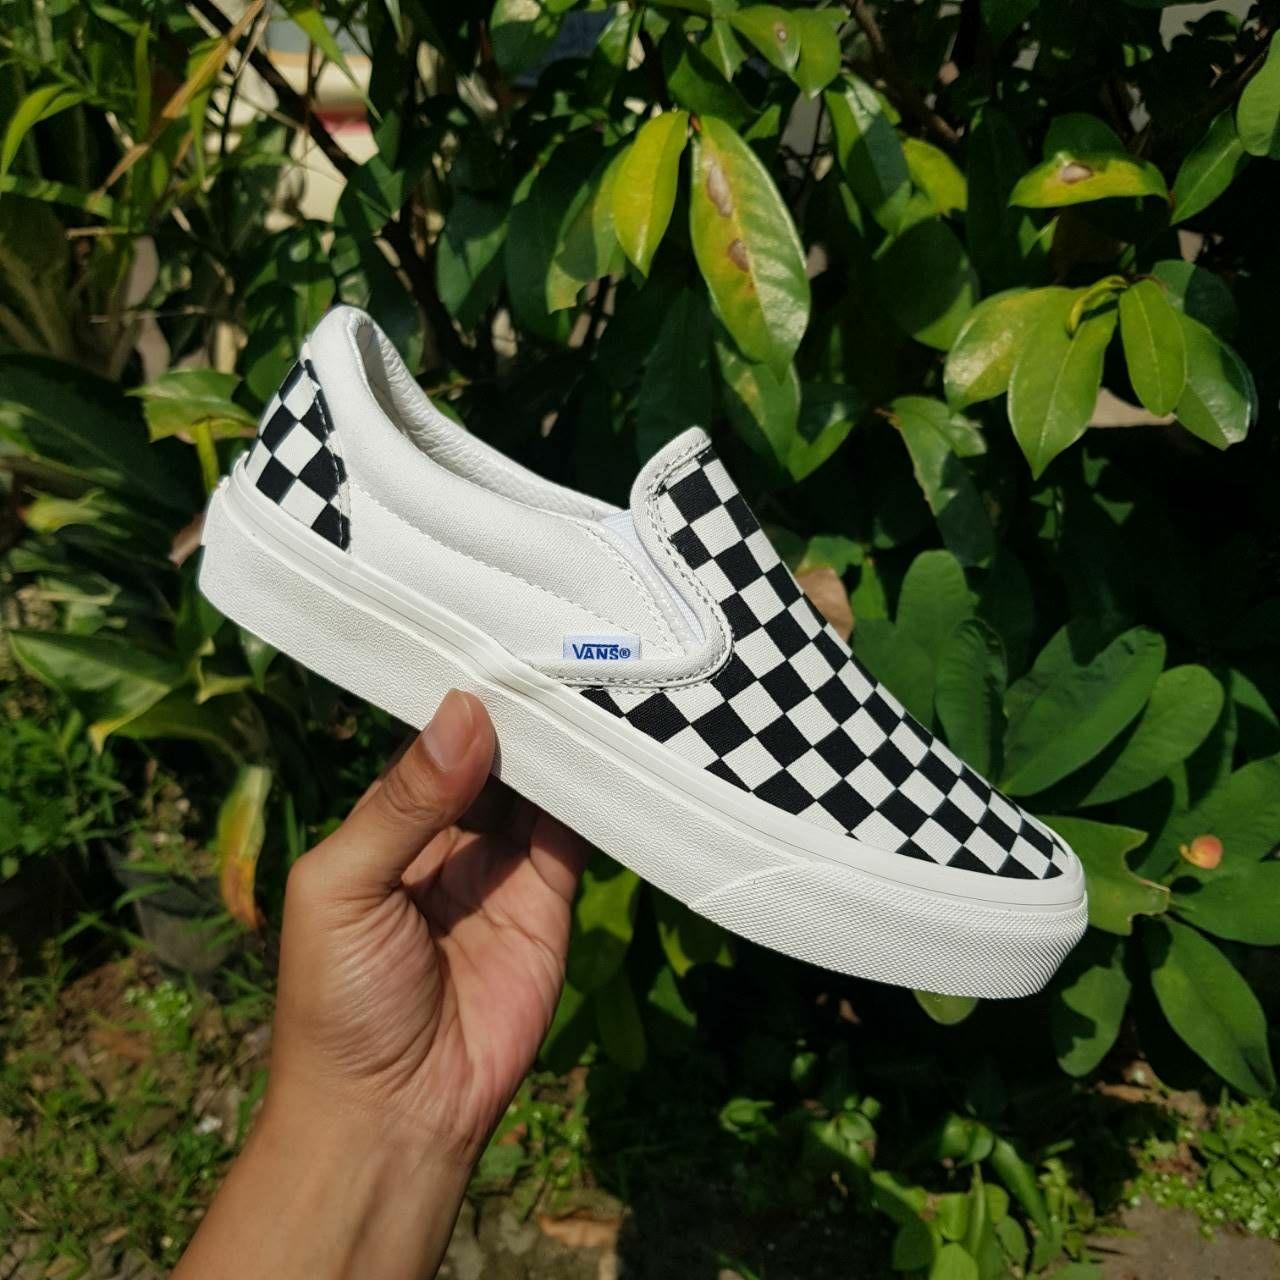 Fitur Promo Sepatu Vans Slip On Checkerboard Black White Dan Harga ... 6499bbb4c3